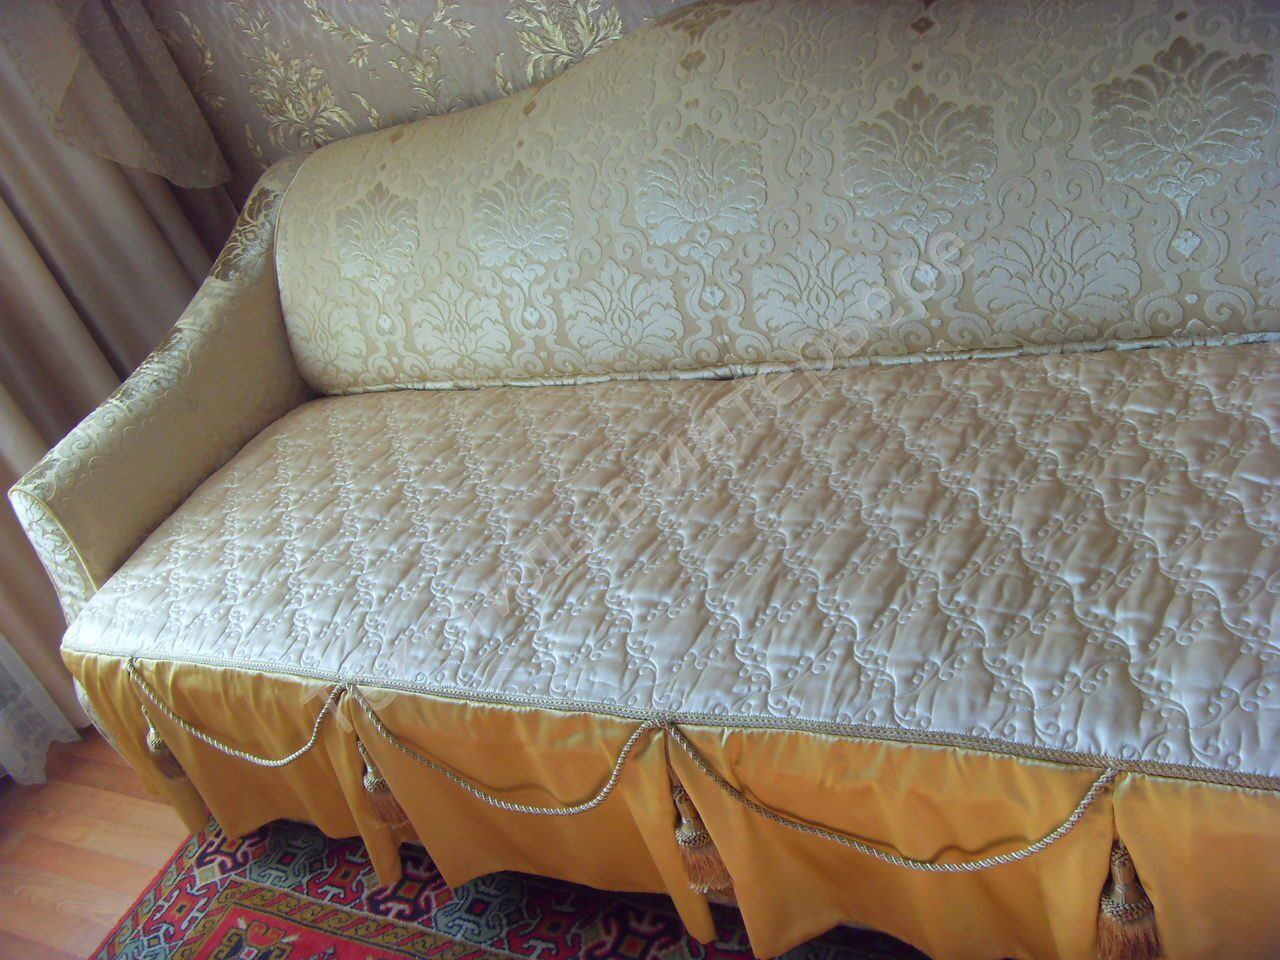 Лечение трещин на пятках в домашних условиях 80